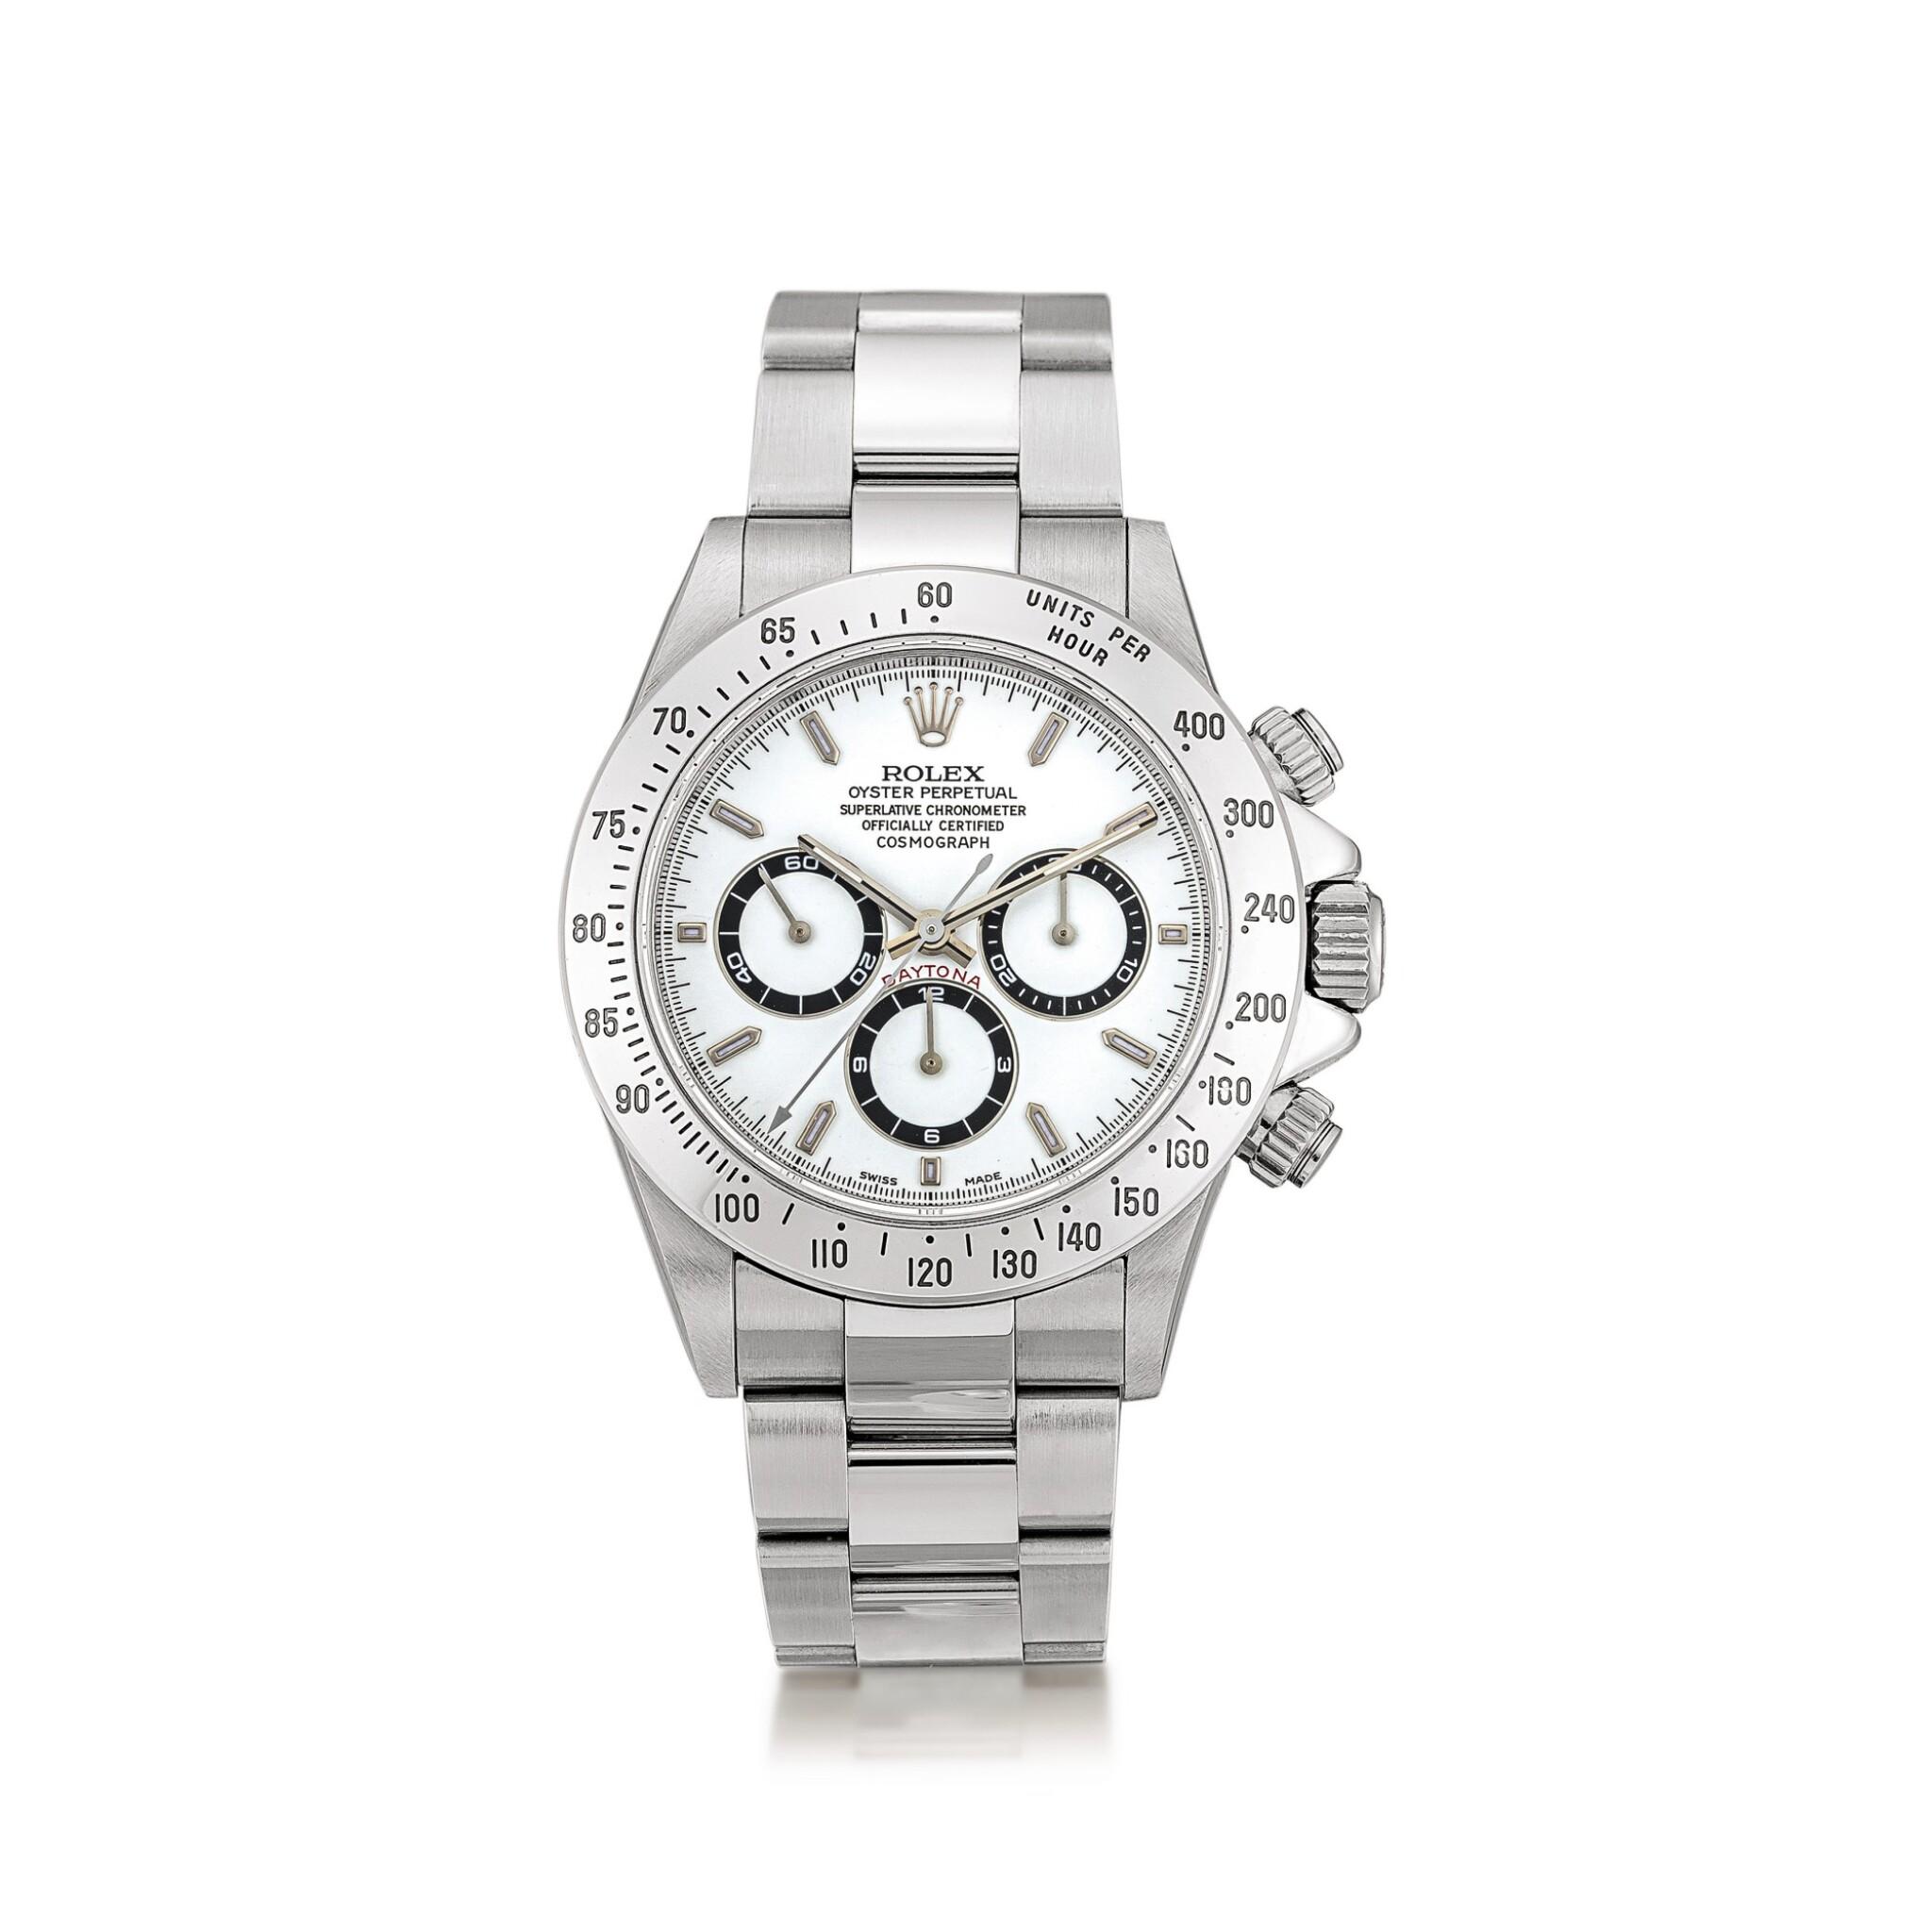 View full screen - View 1 of Lot 2147. Rolex | Cosmograph Daytona, Reference 16520, A stainless steel chronograph wristwatch with bracelet, Circa 1999 | 勞力士 | Cosmograph Daytona 型號16520    精鋼計時鏈帶腕錶,約1999年製.